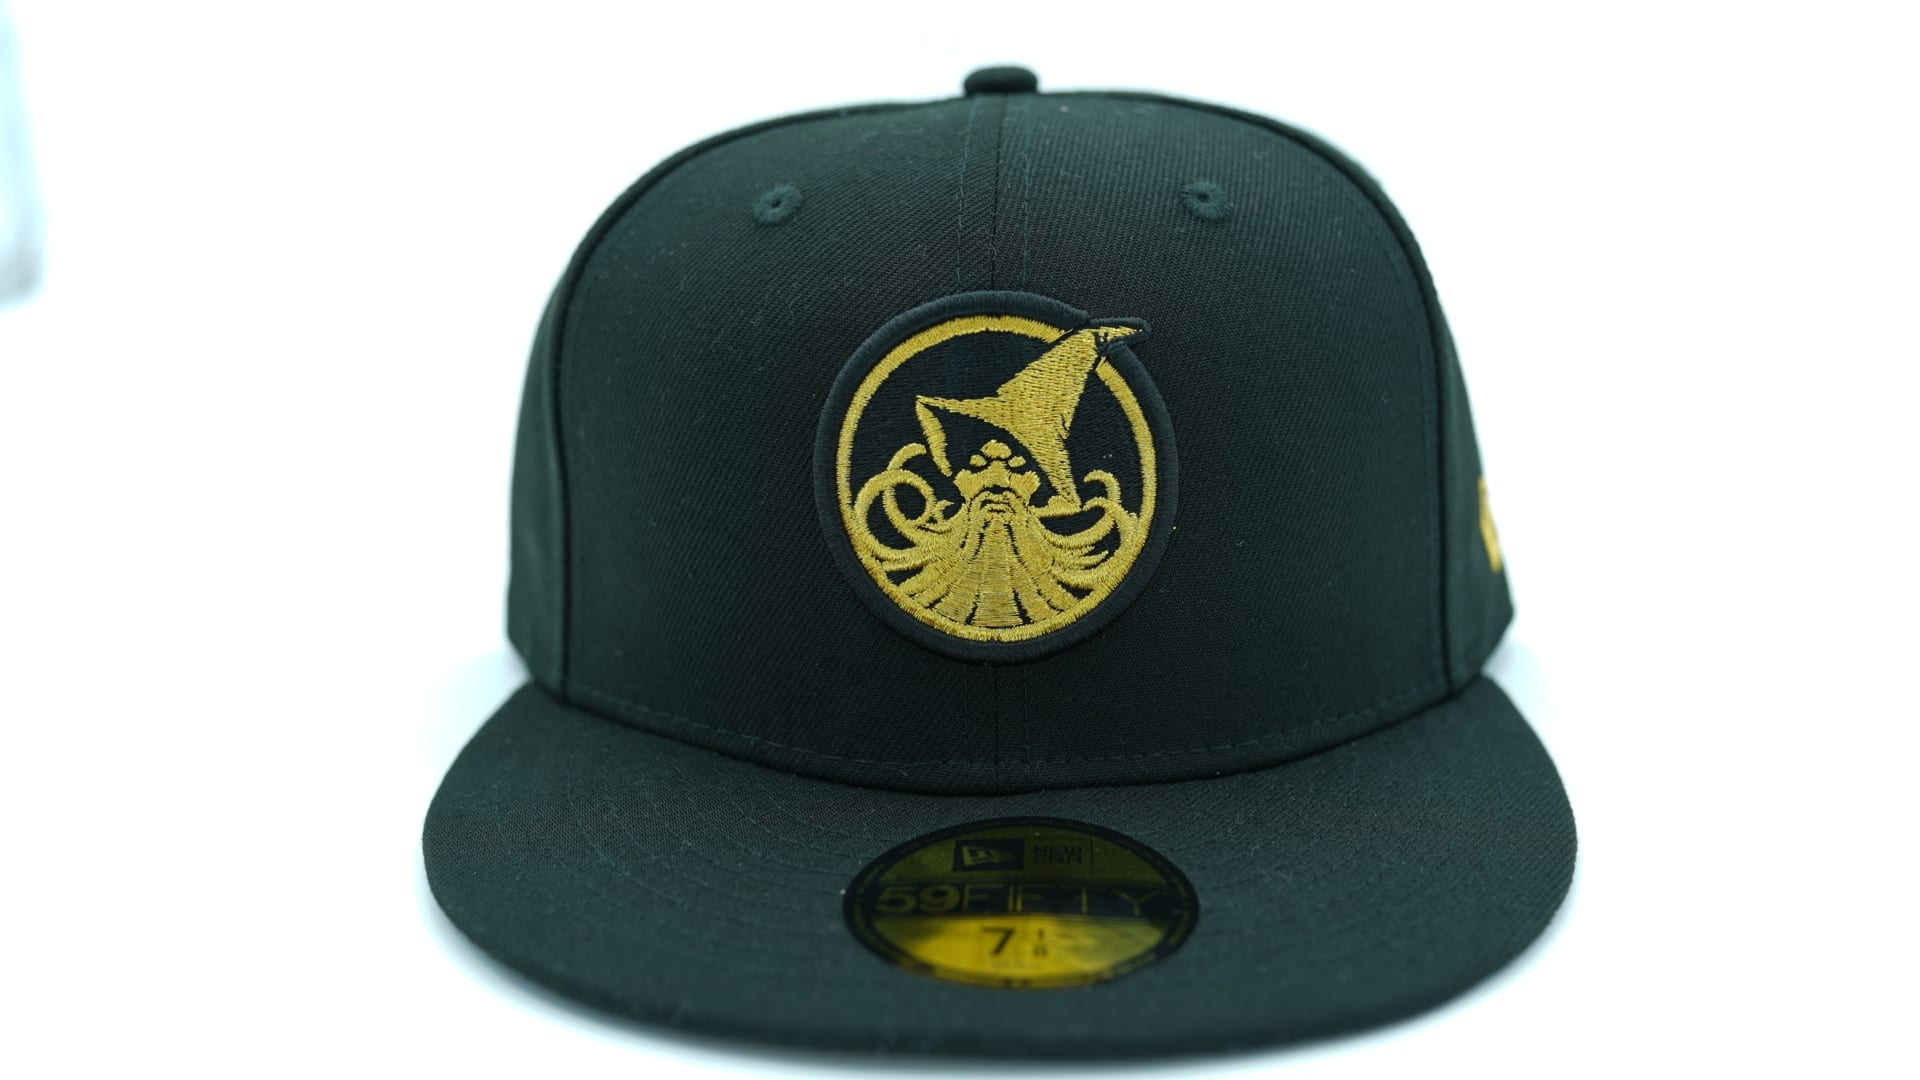 Wonder Woman Movie Battle Armor 59Fifty Fitted Hat by NEW ERA x DC ... 873febf6e04b